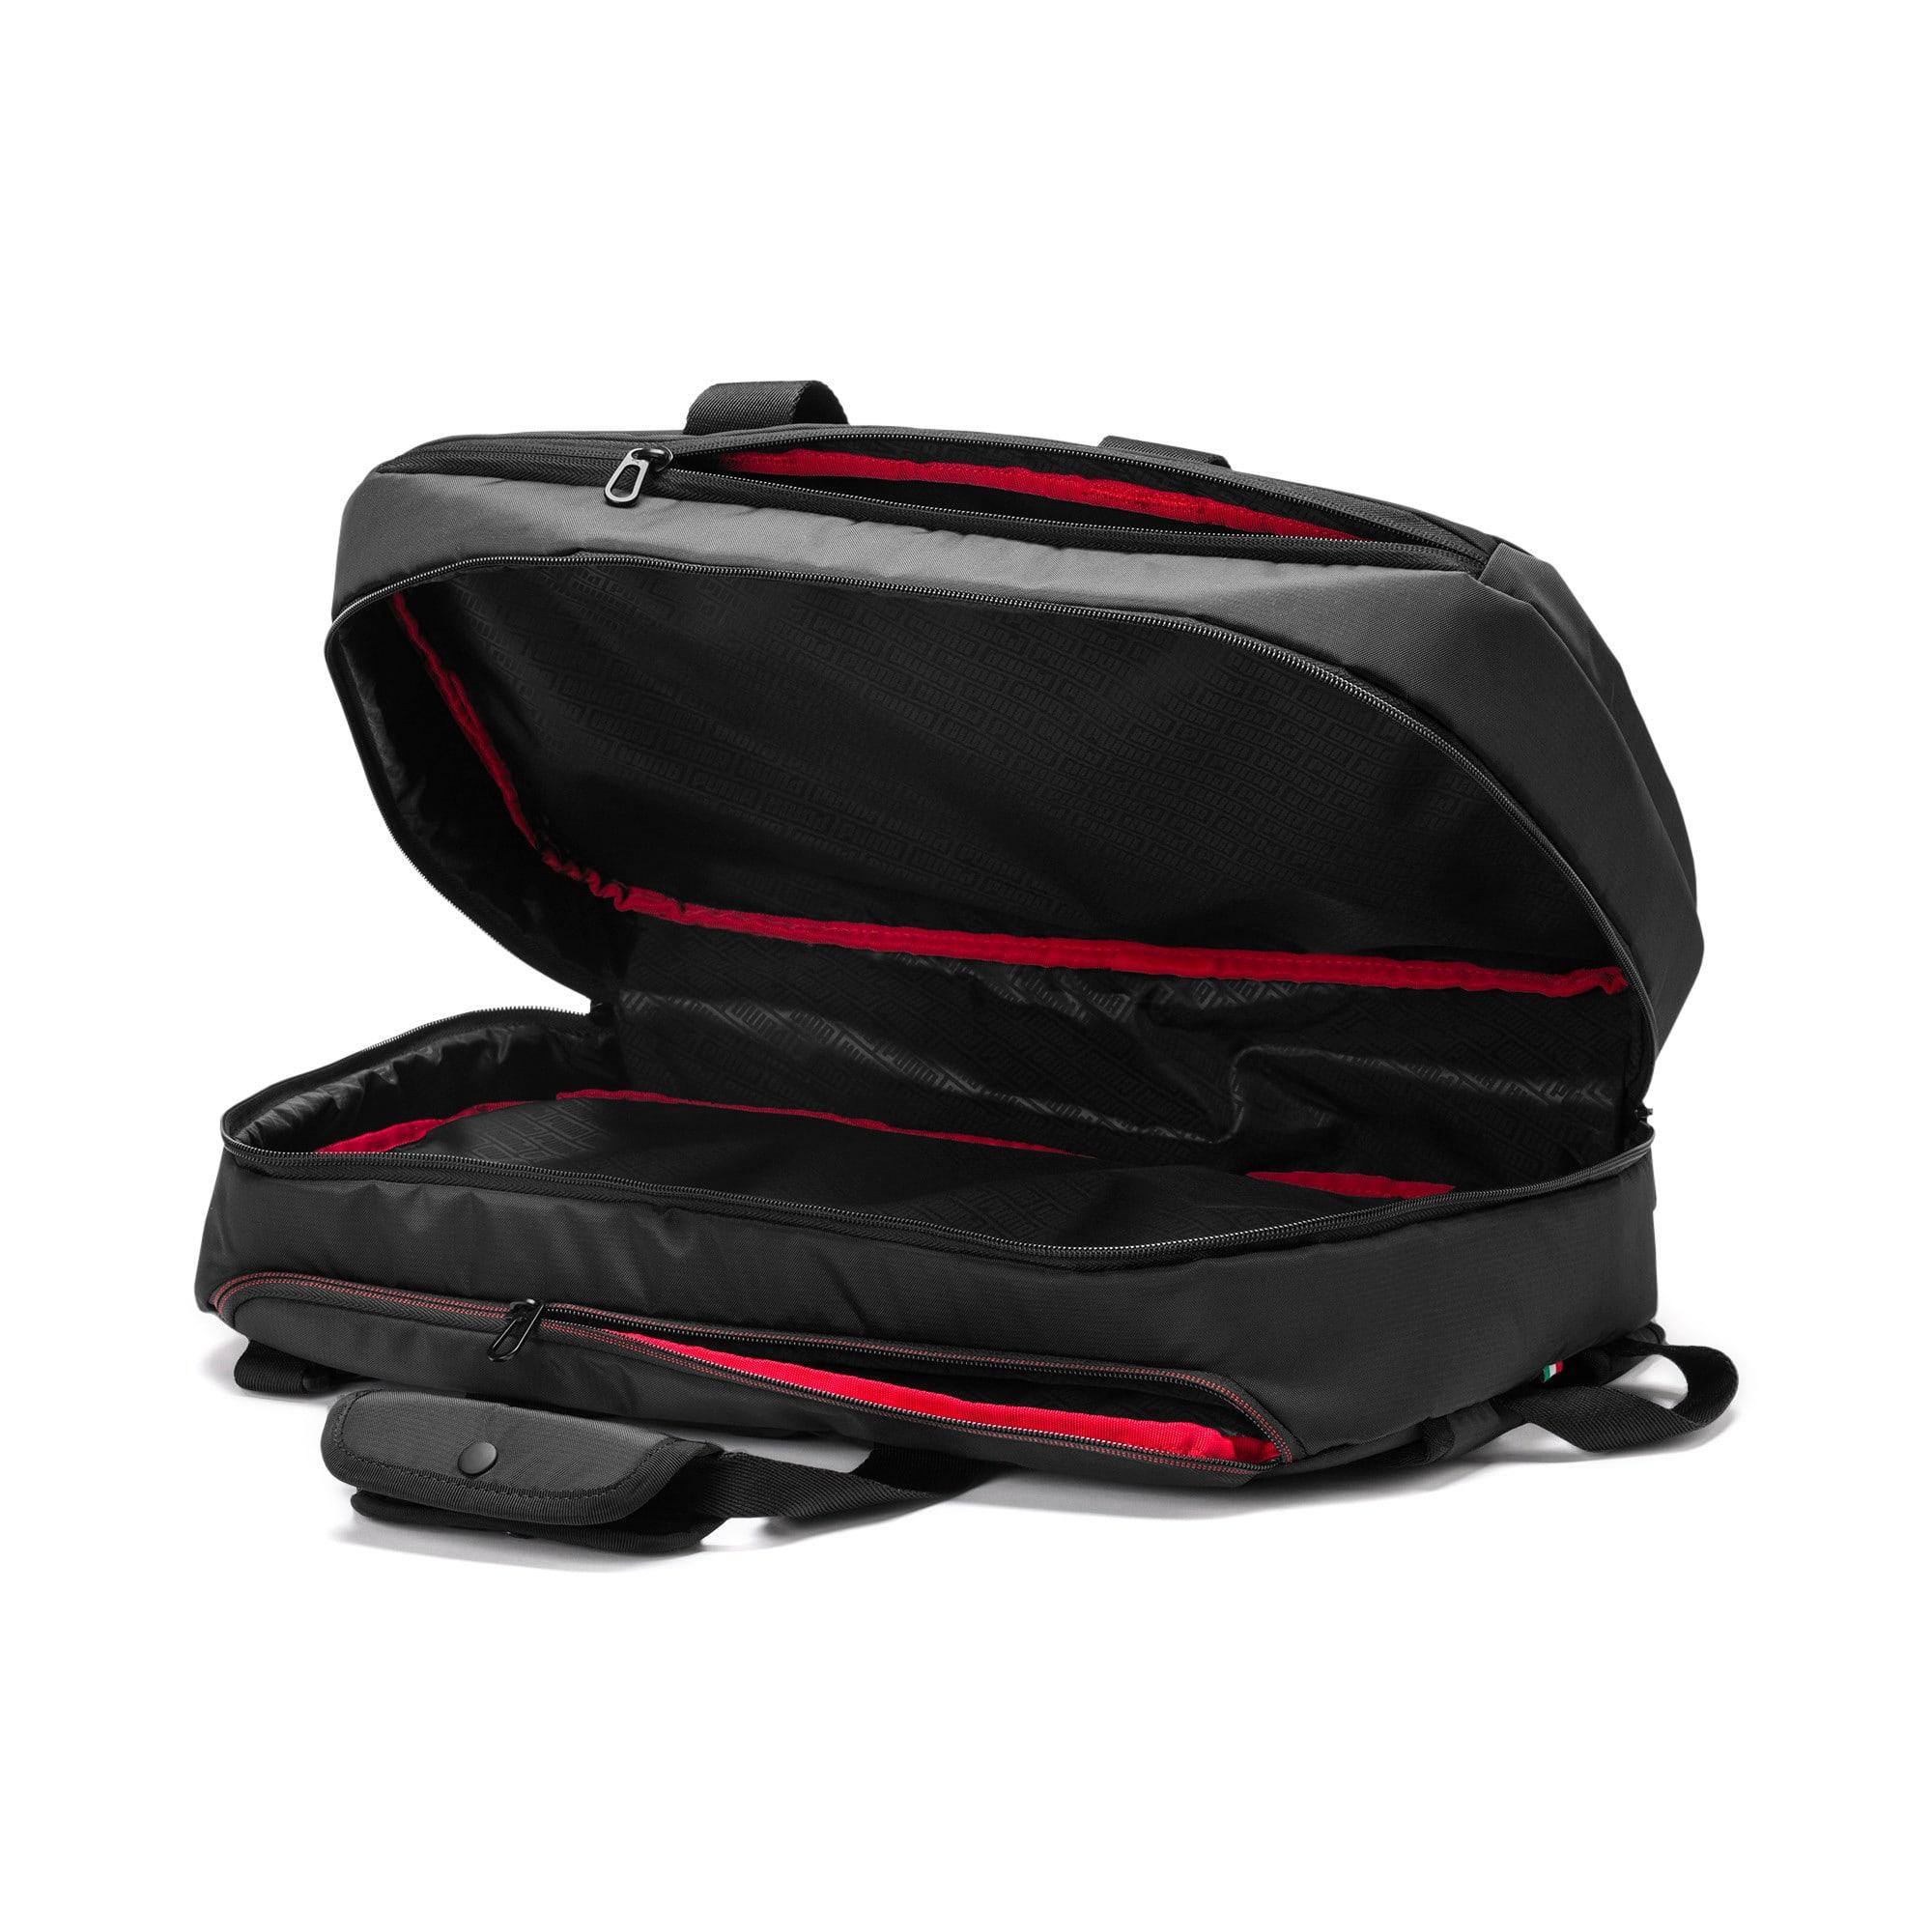 Thumbnail 6 of Ferrari Lifestyle RCT Backpack, Puma Black, medium-IND